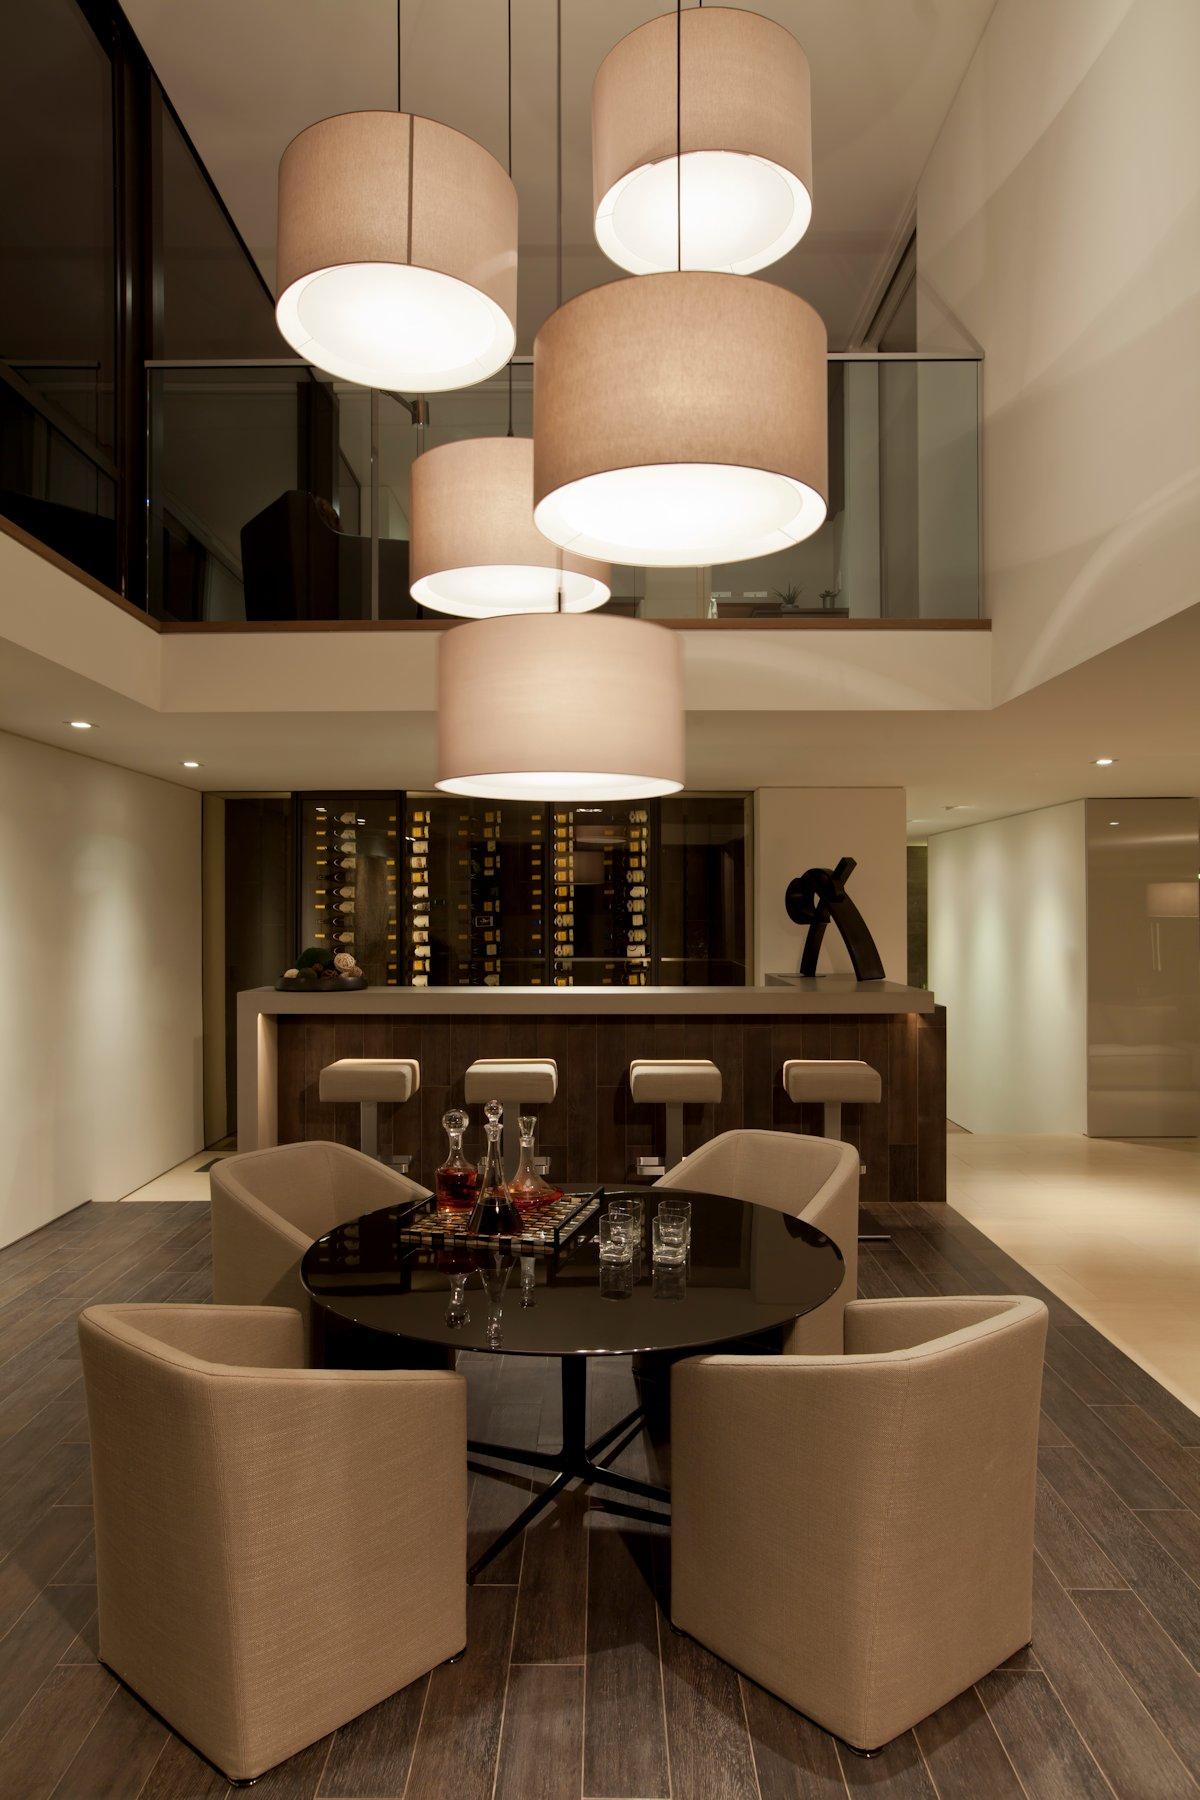 Wine Room, Lighting, Table, Beach House in Laguna Beach, California